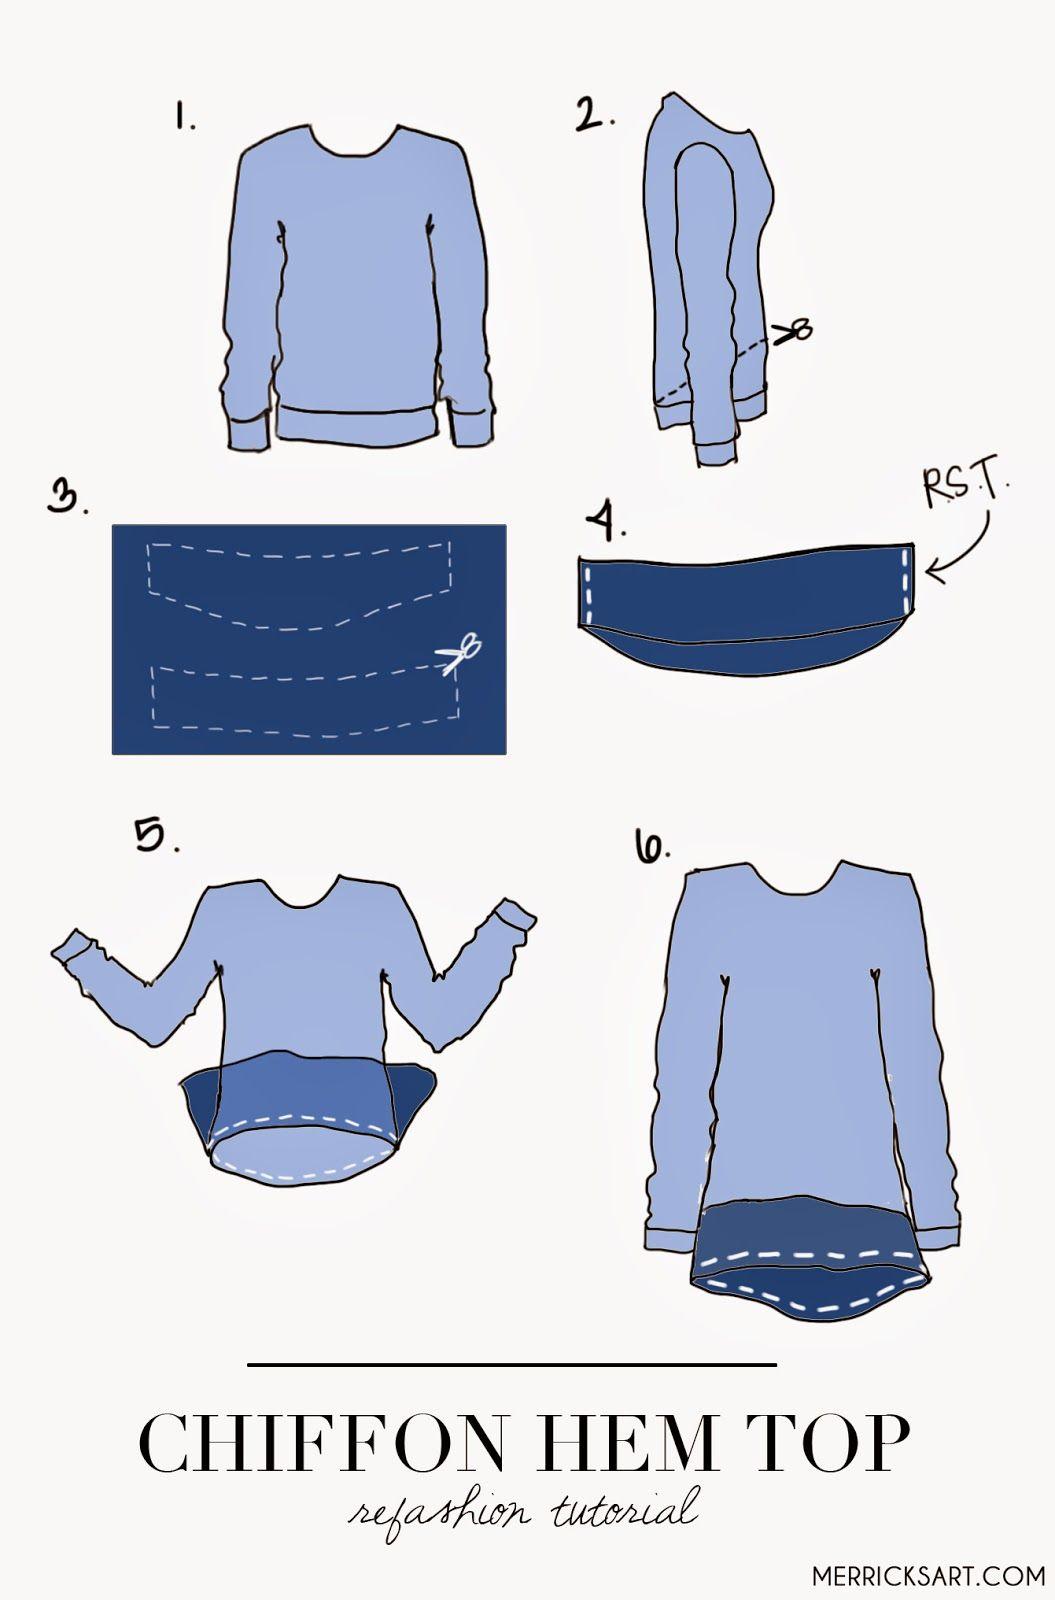 CHIFFON HEM REFASHION TUTORIAL | Costura, Ropa reciclada y Ropa